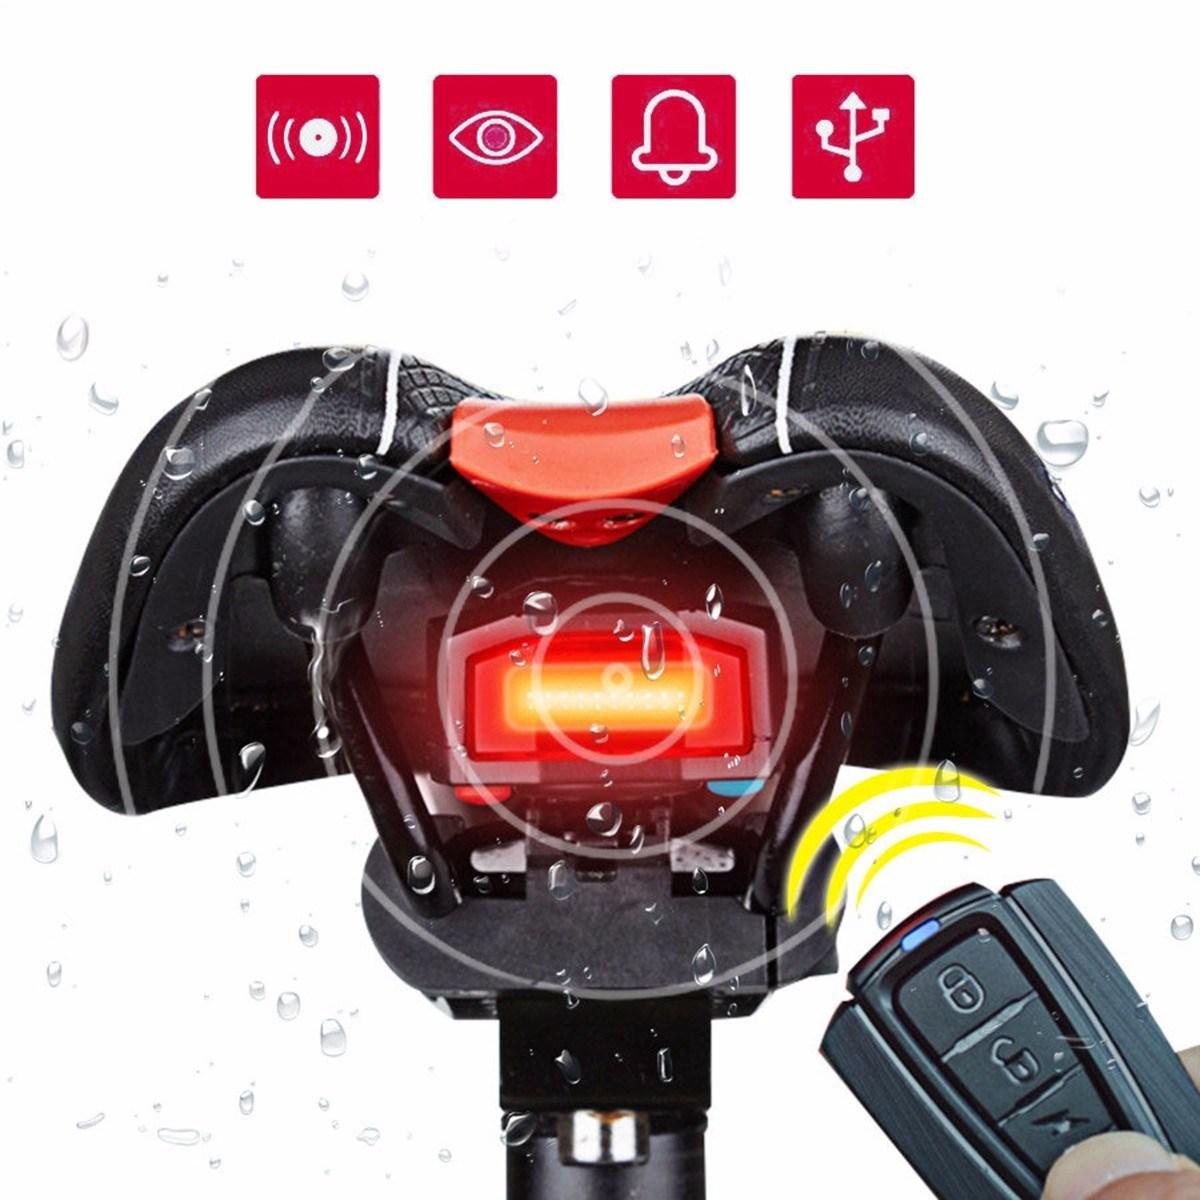 купить New 3 in 1 Bicycle Wireless Smart Bell COB Tailight Bike Remote Control Alarm Lock Fixed Position USB Charging Bike Rear Light по цене 1223.28 рублей